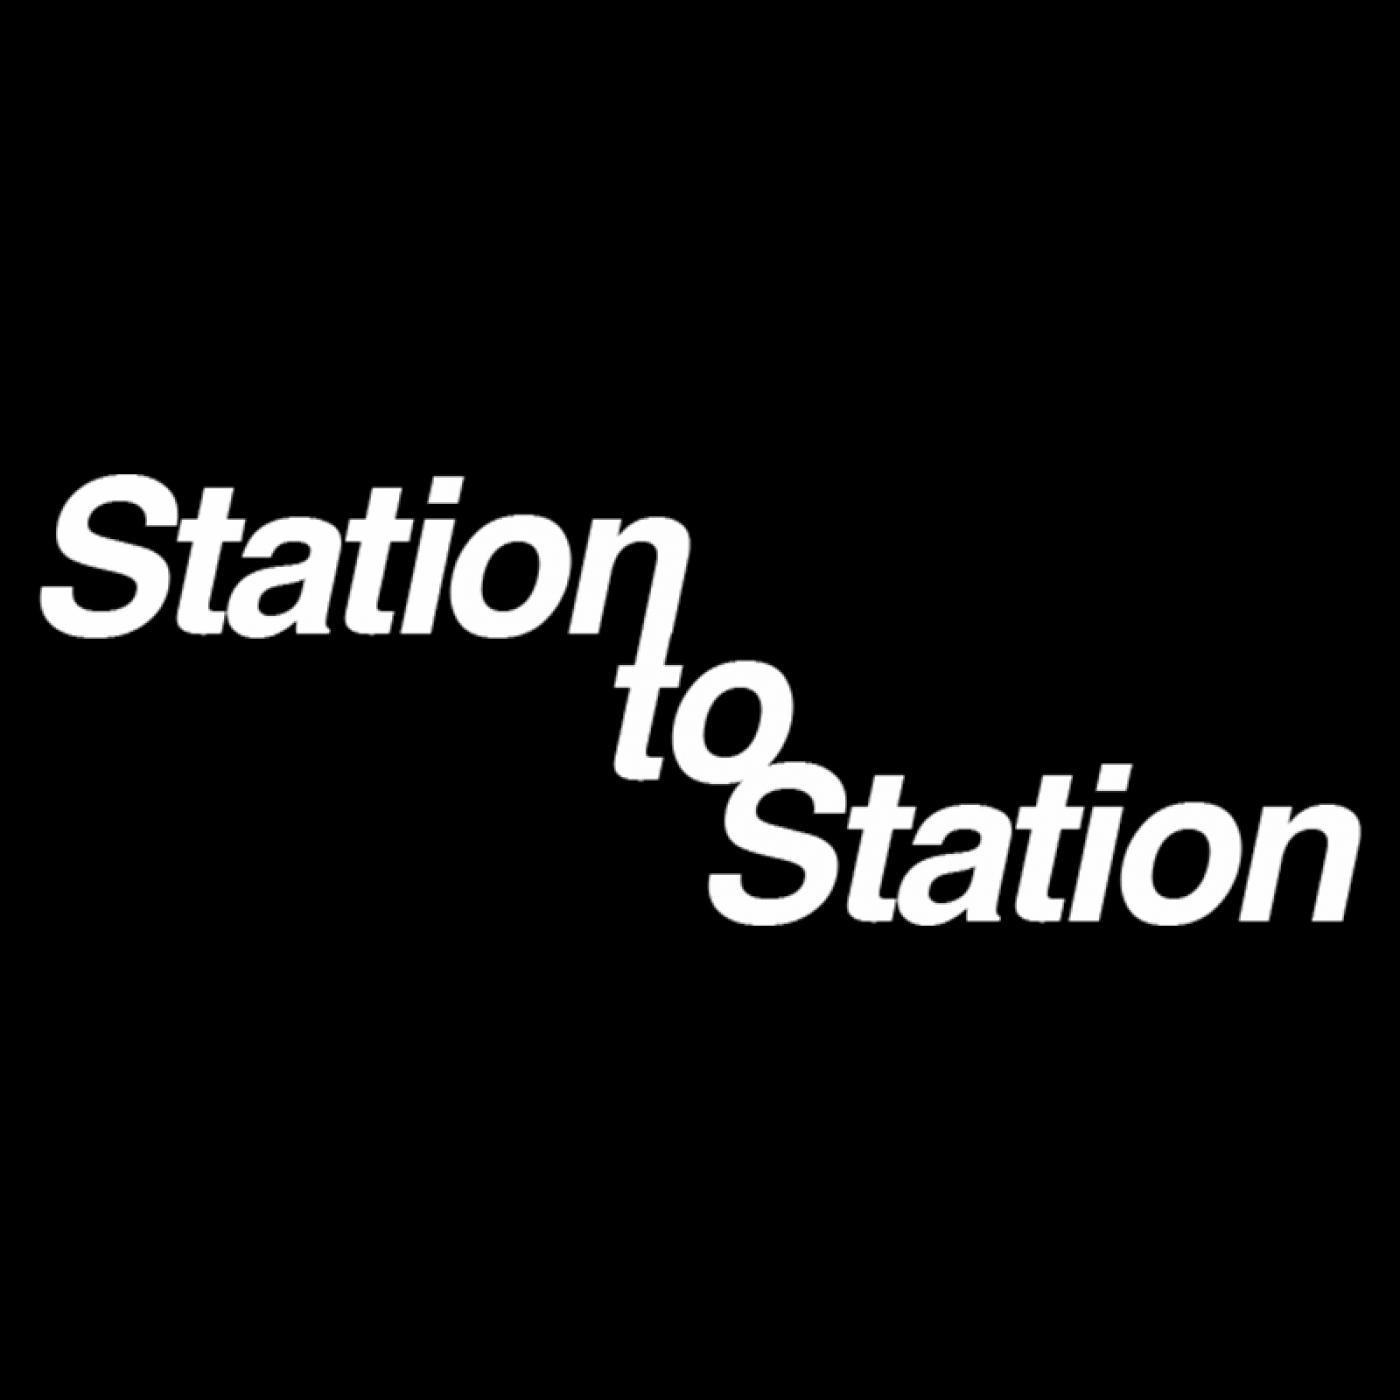 <![CDATA[Station to Station]]>